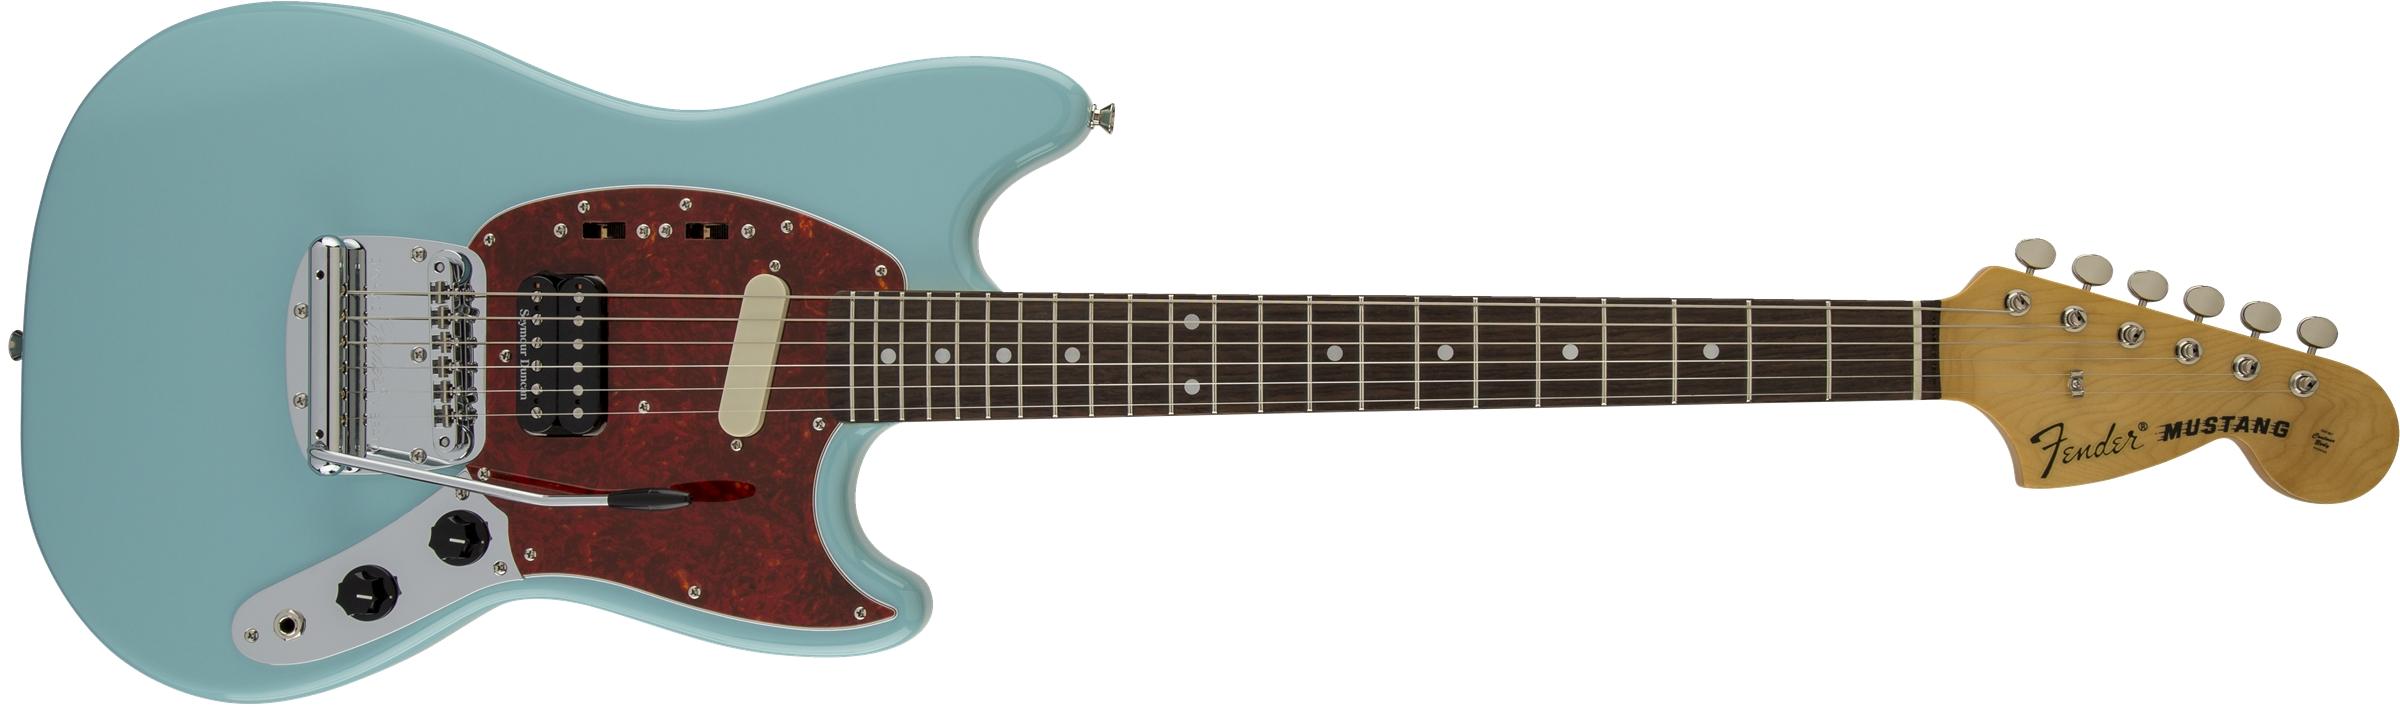 kurts preferred live guitar reviews fender kurt cobain mustang audiofanzine. Black Bedroom Furniture Sets. Home Design Ideas